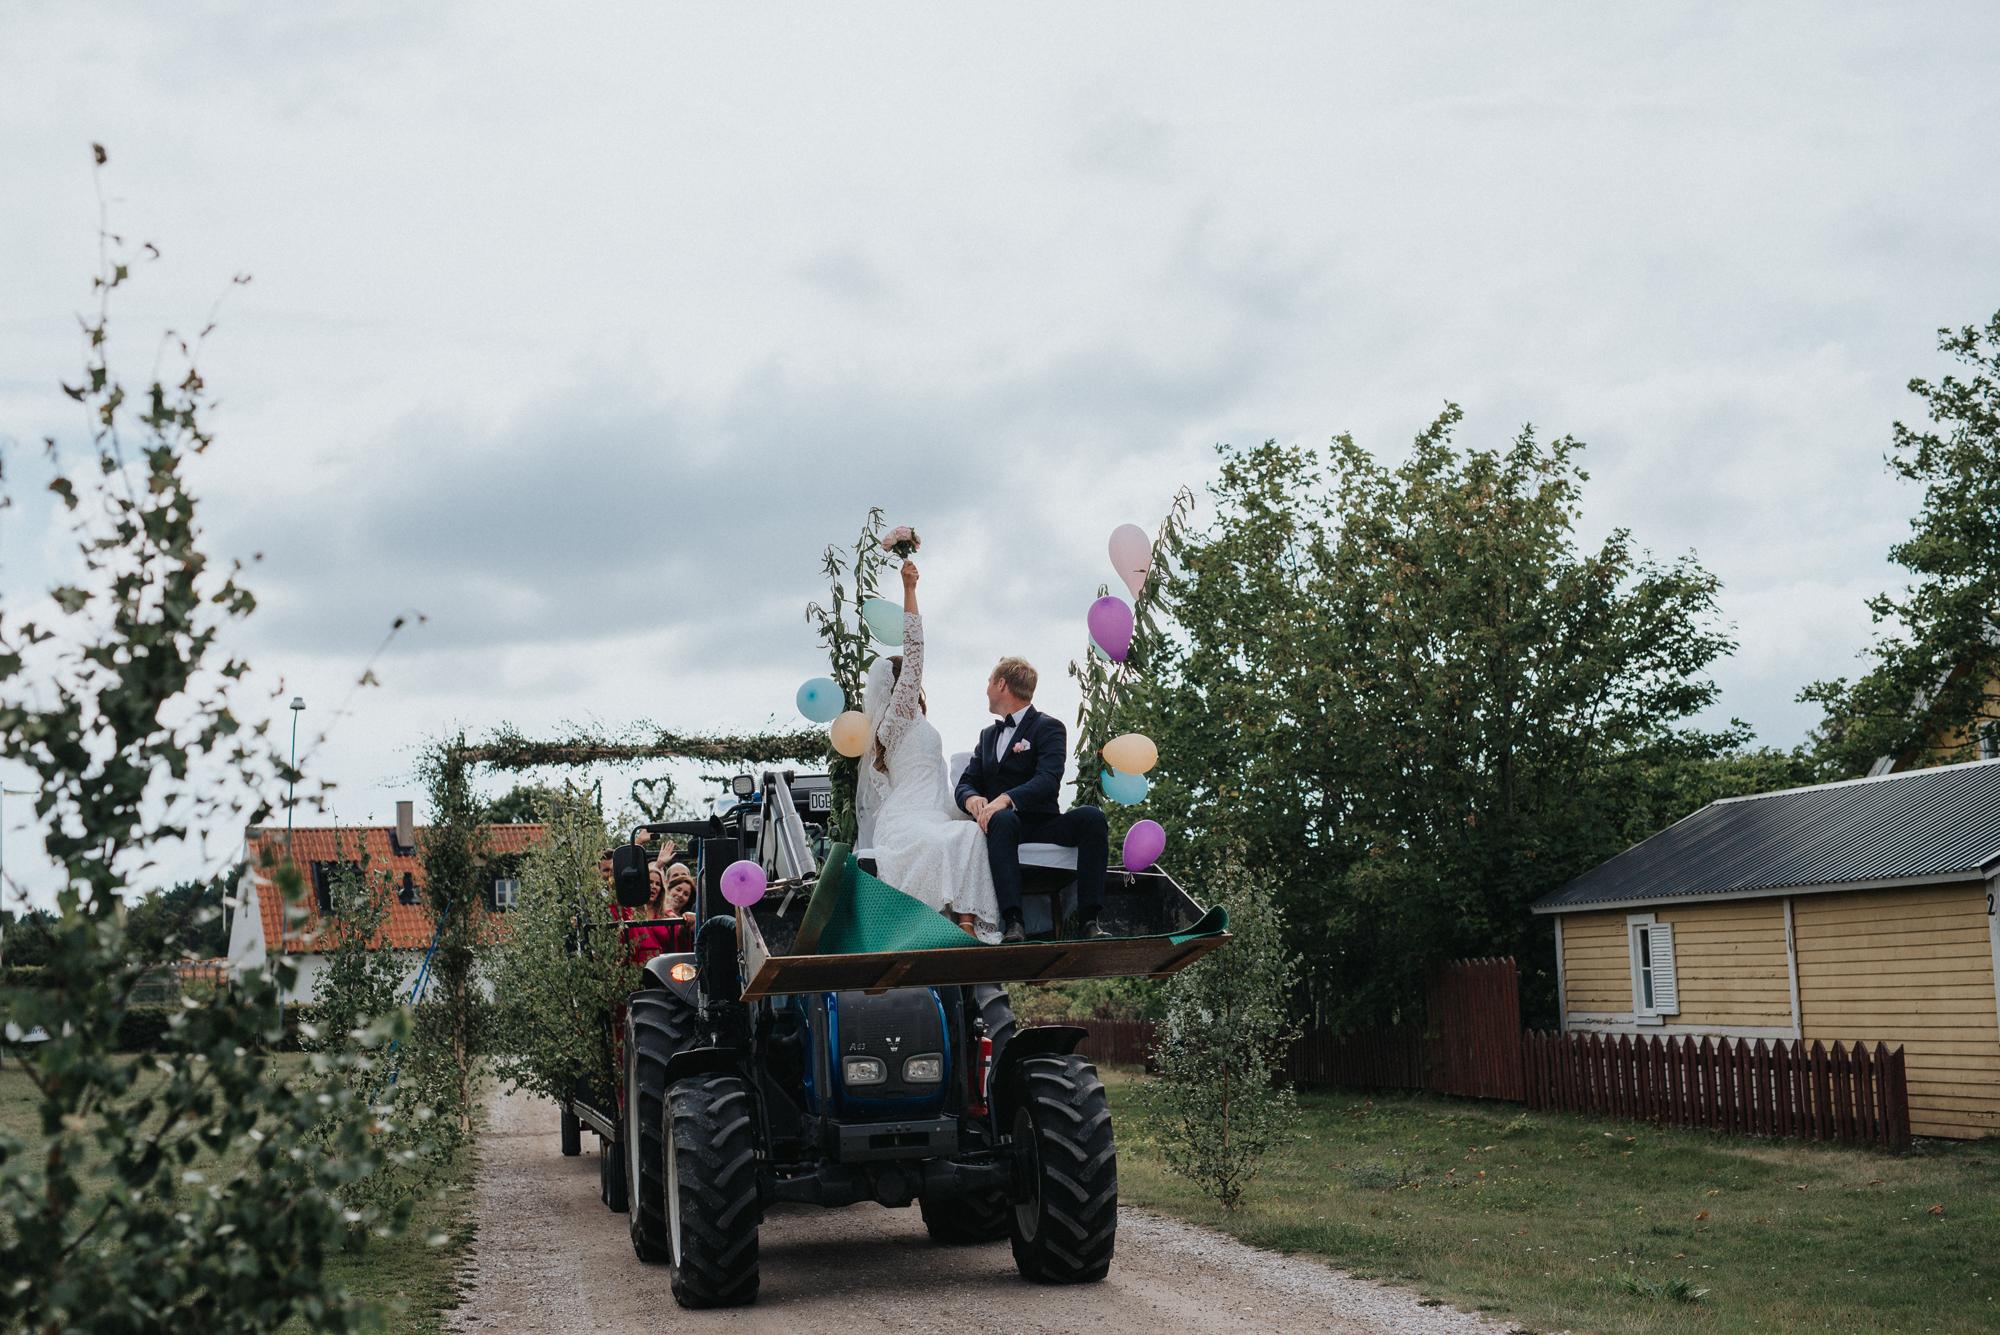 051-bröllopsfotograf-folhammar-gotland-neas-fotografi.jpg